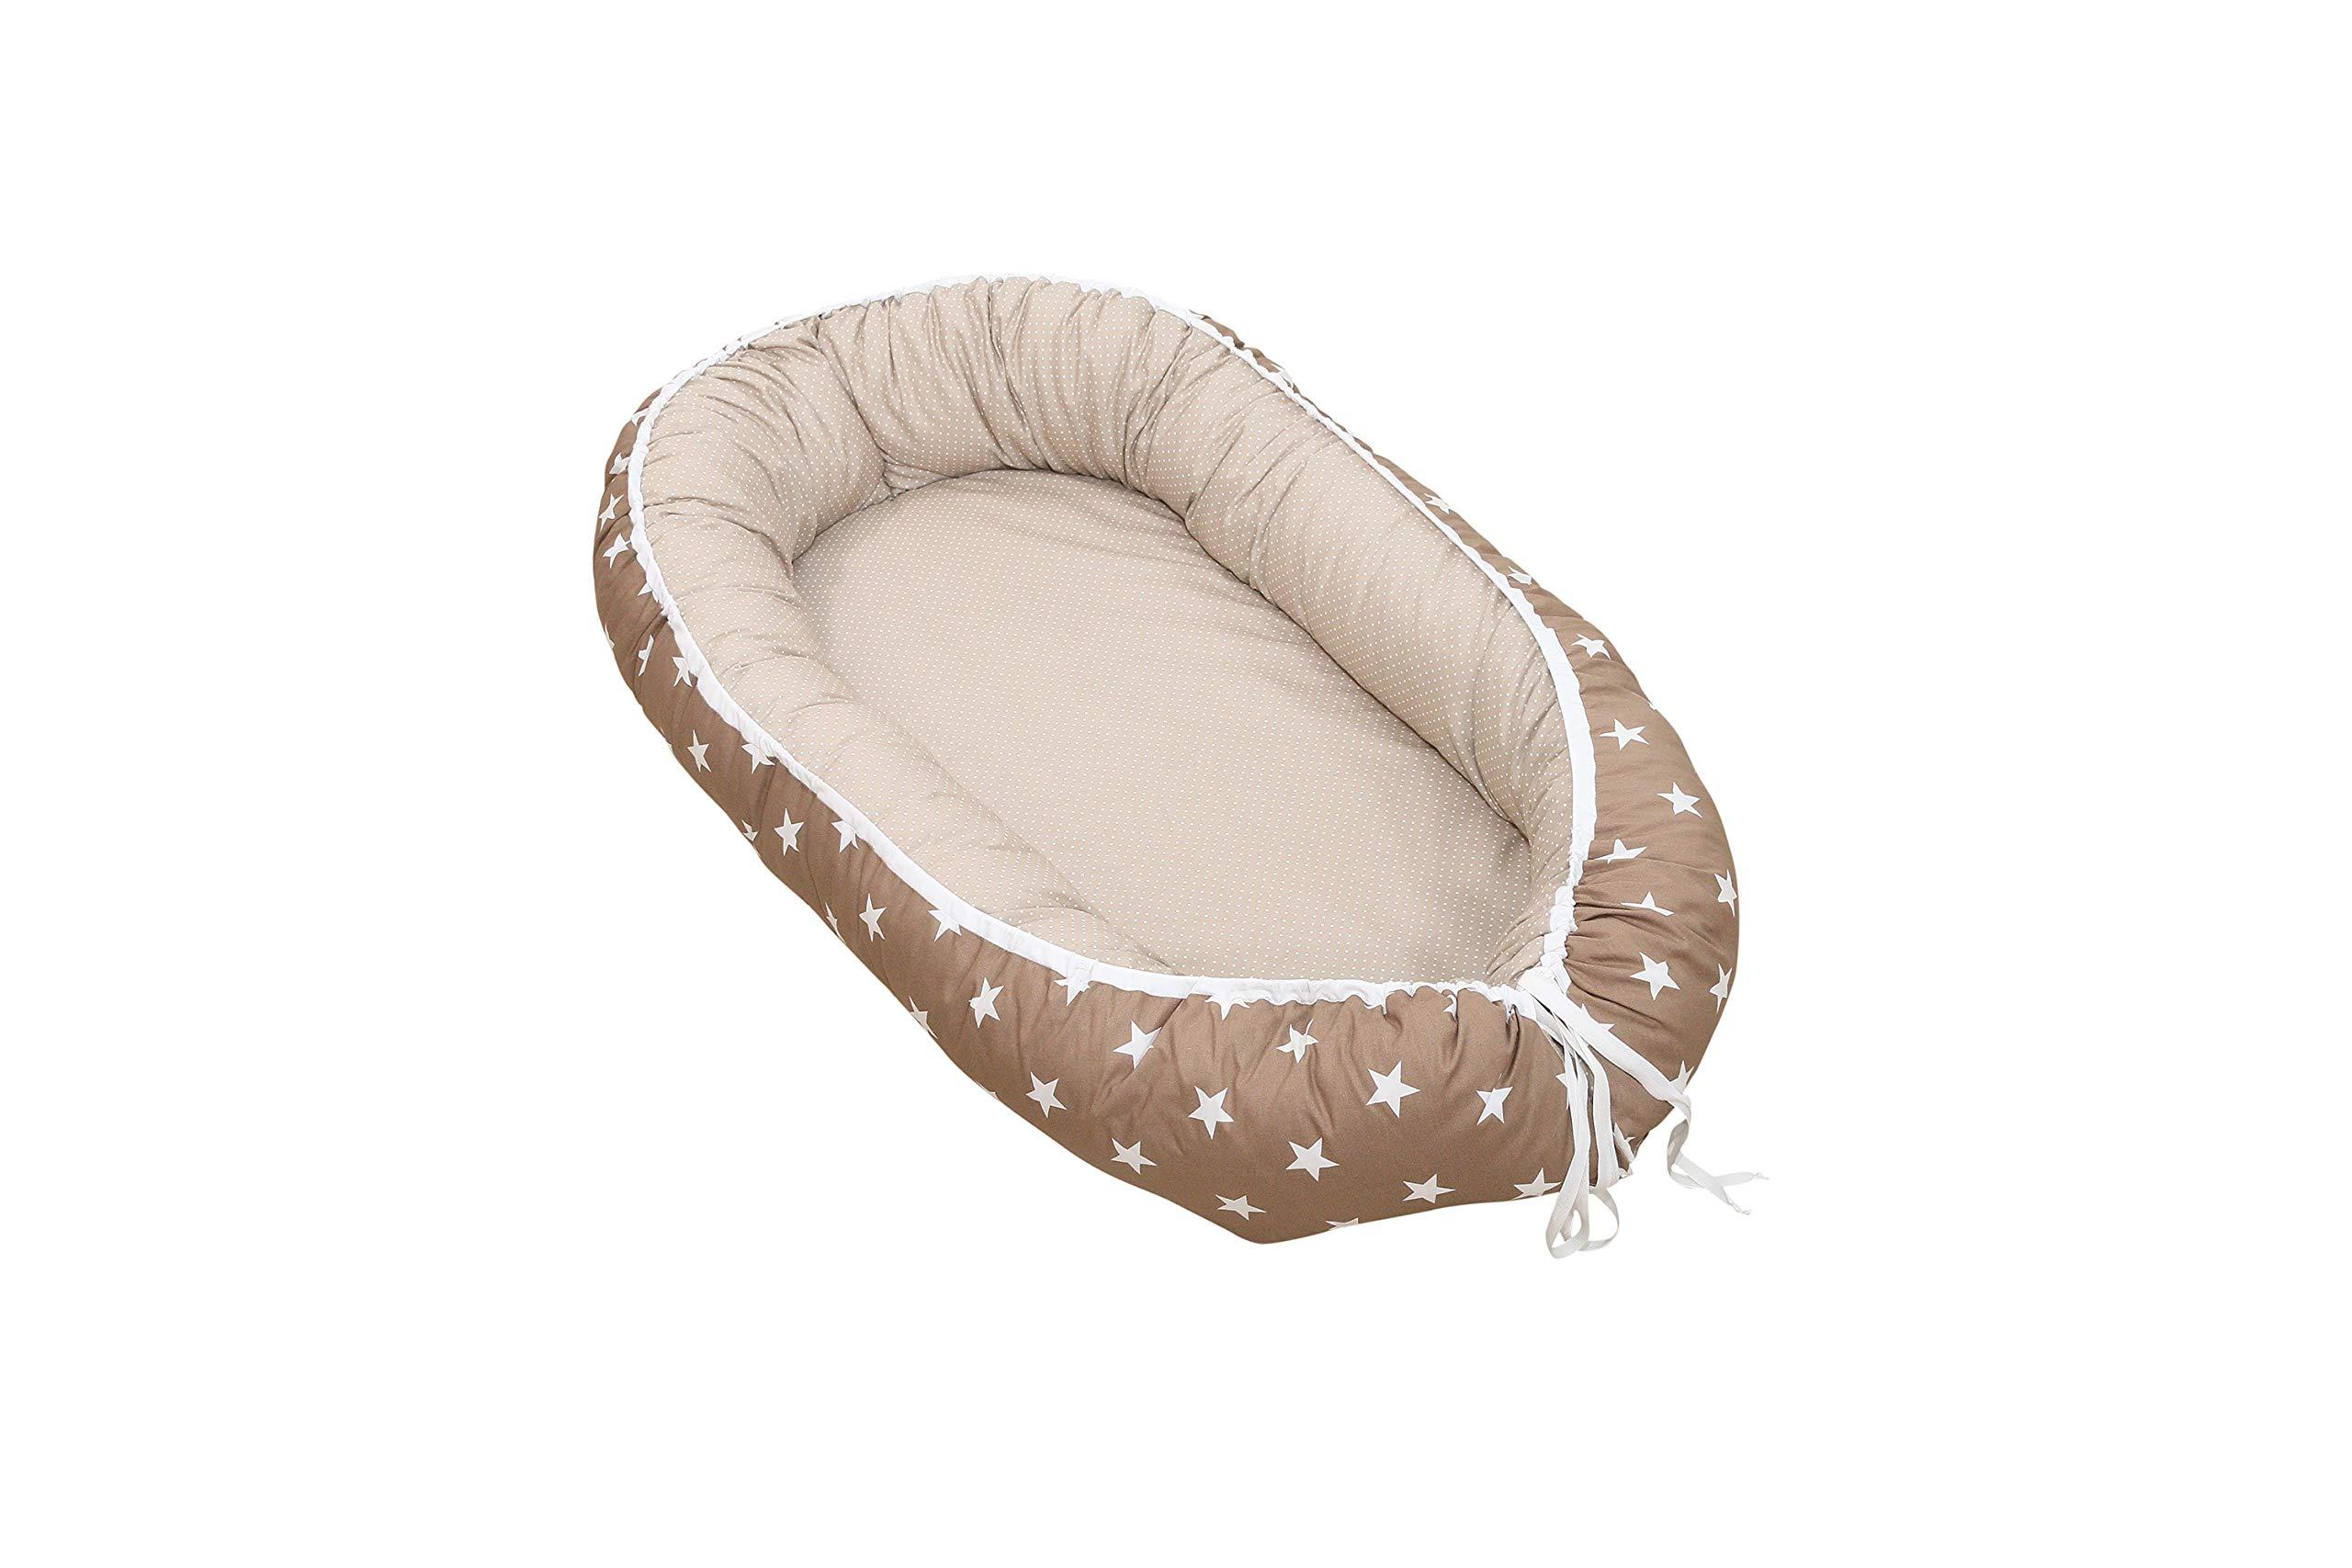 Soft Cotton Baby Lounger by ULLENBOOM   Stars/Polka Dots   Newborn Snuggle Nest   22'' x 37'' - Unisex Sand/Beige by ULLENBOOM